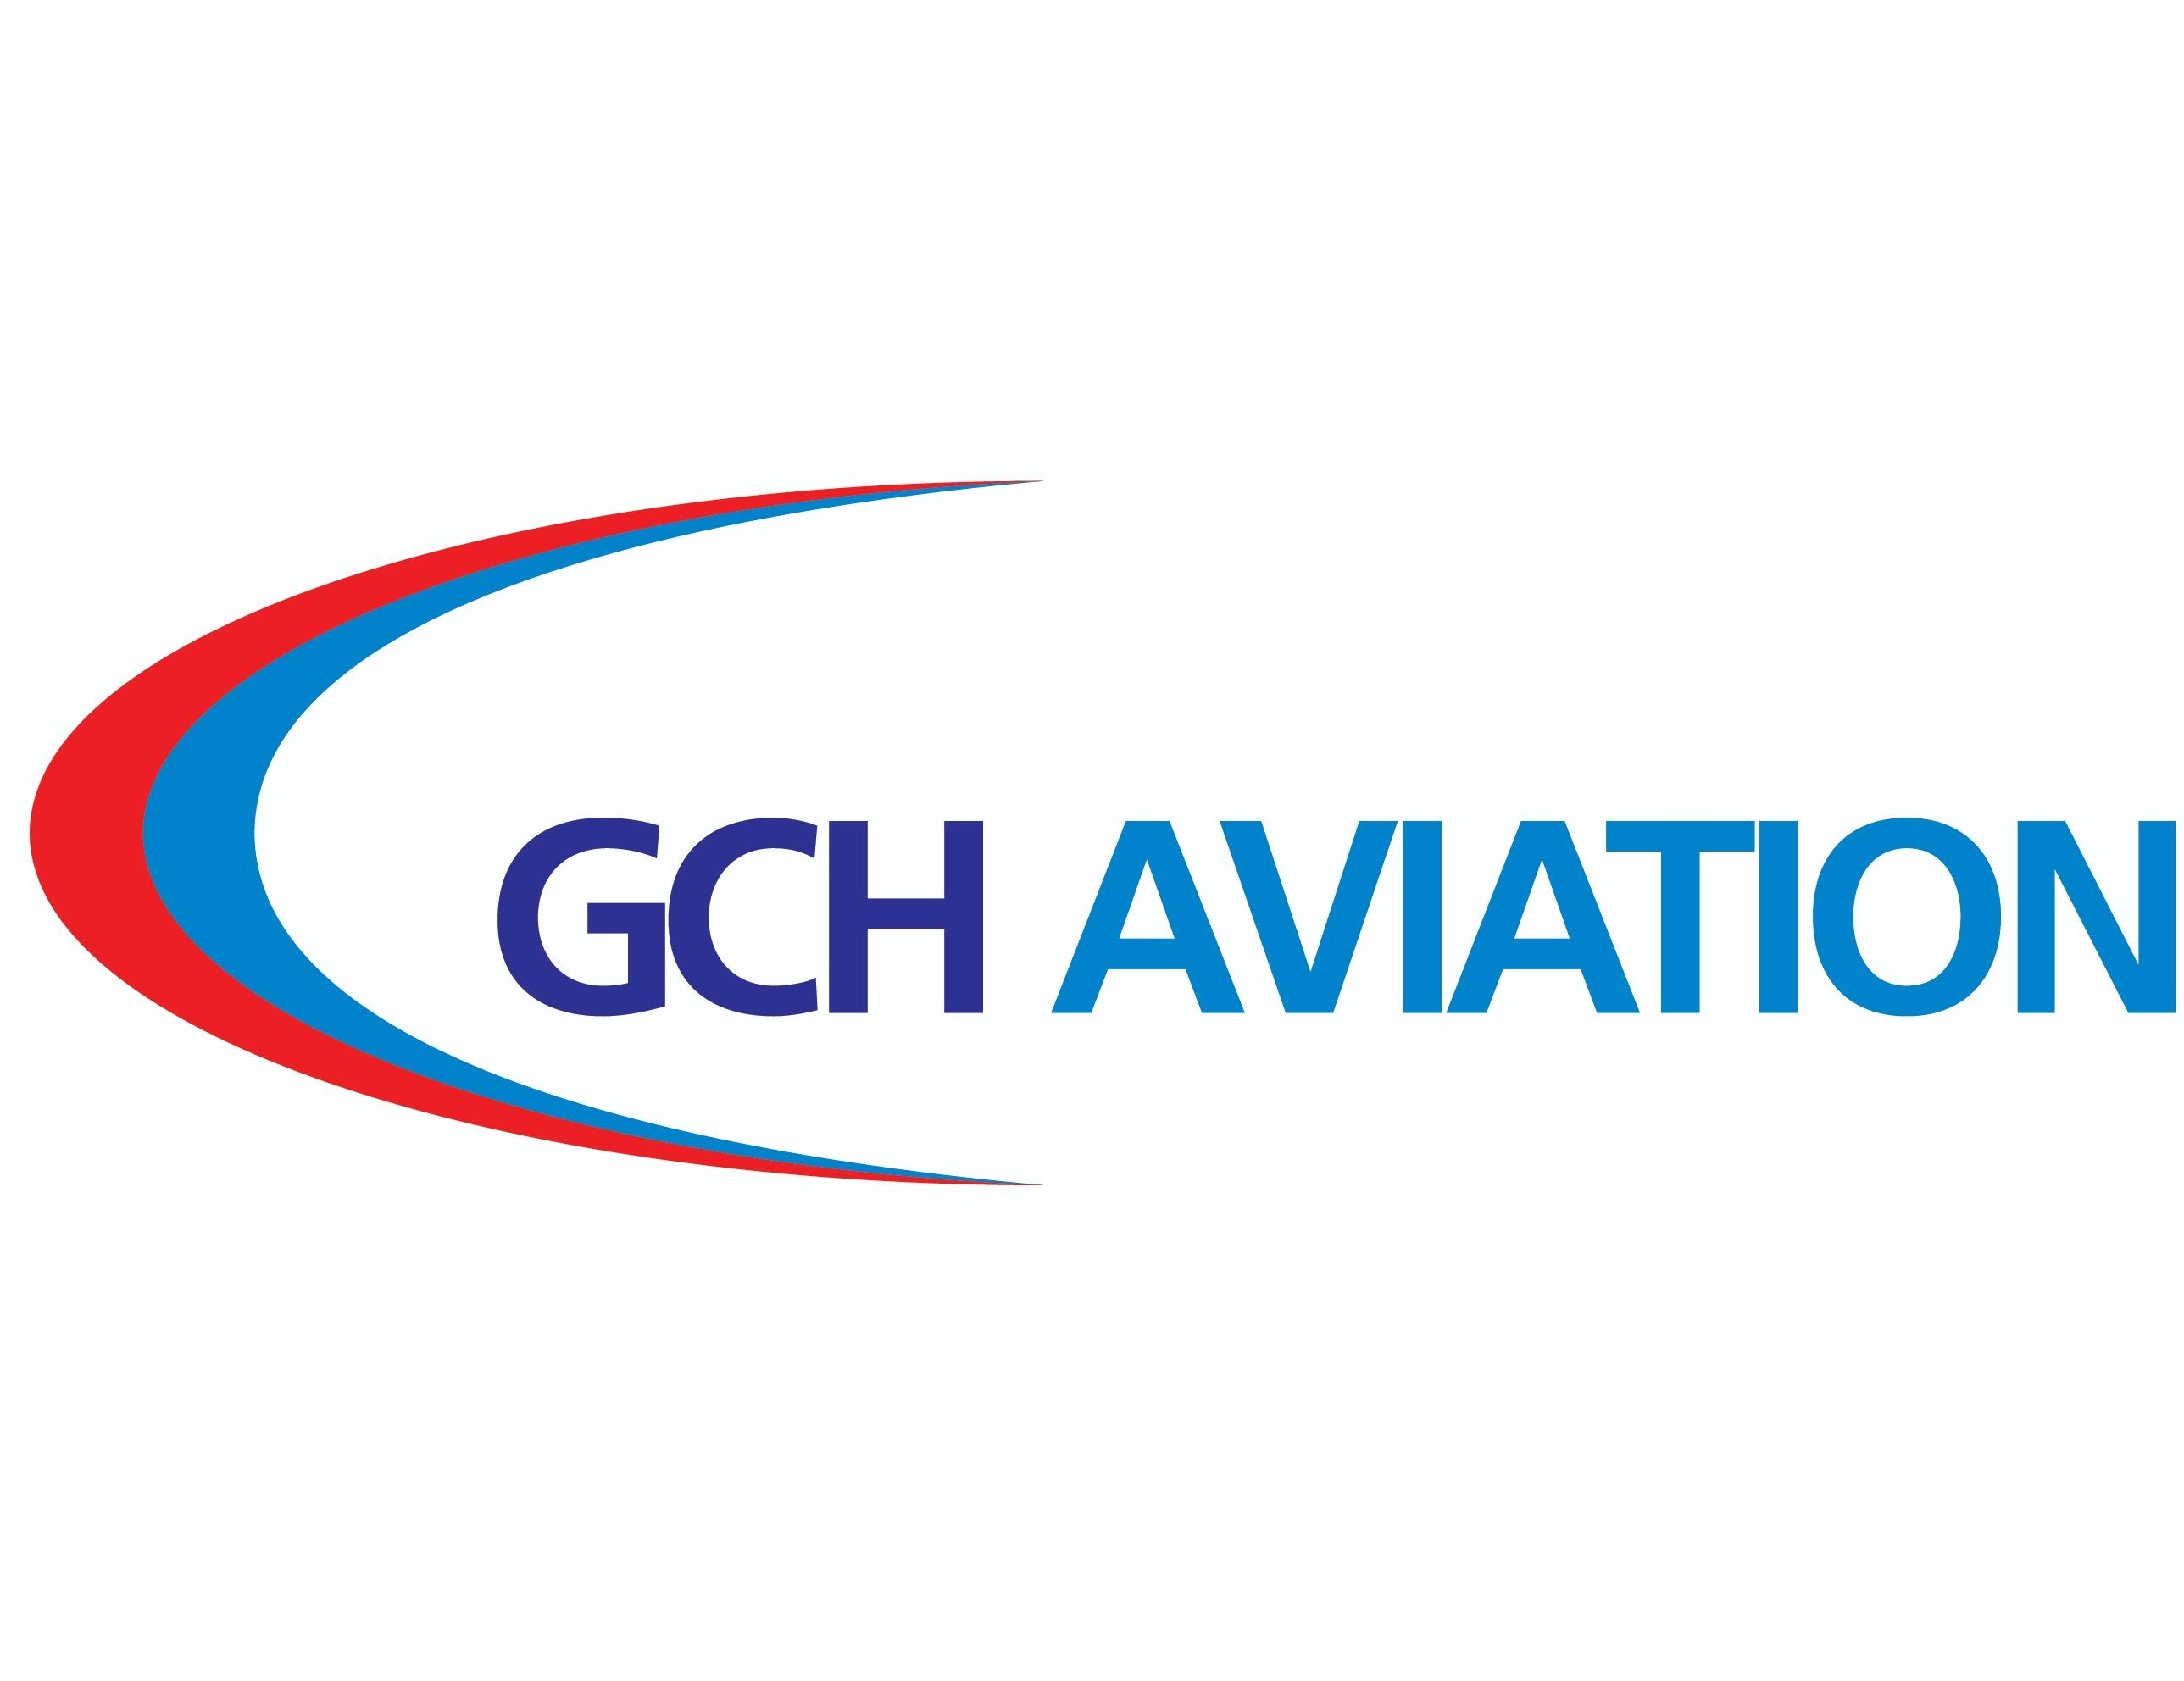 Garden City Helicopters Ltd